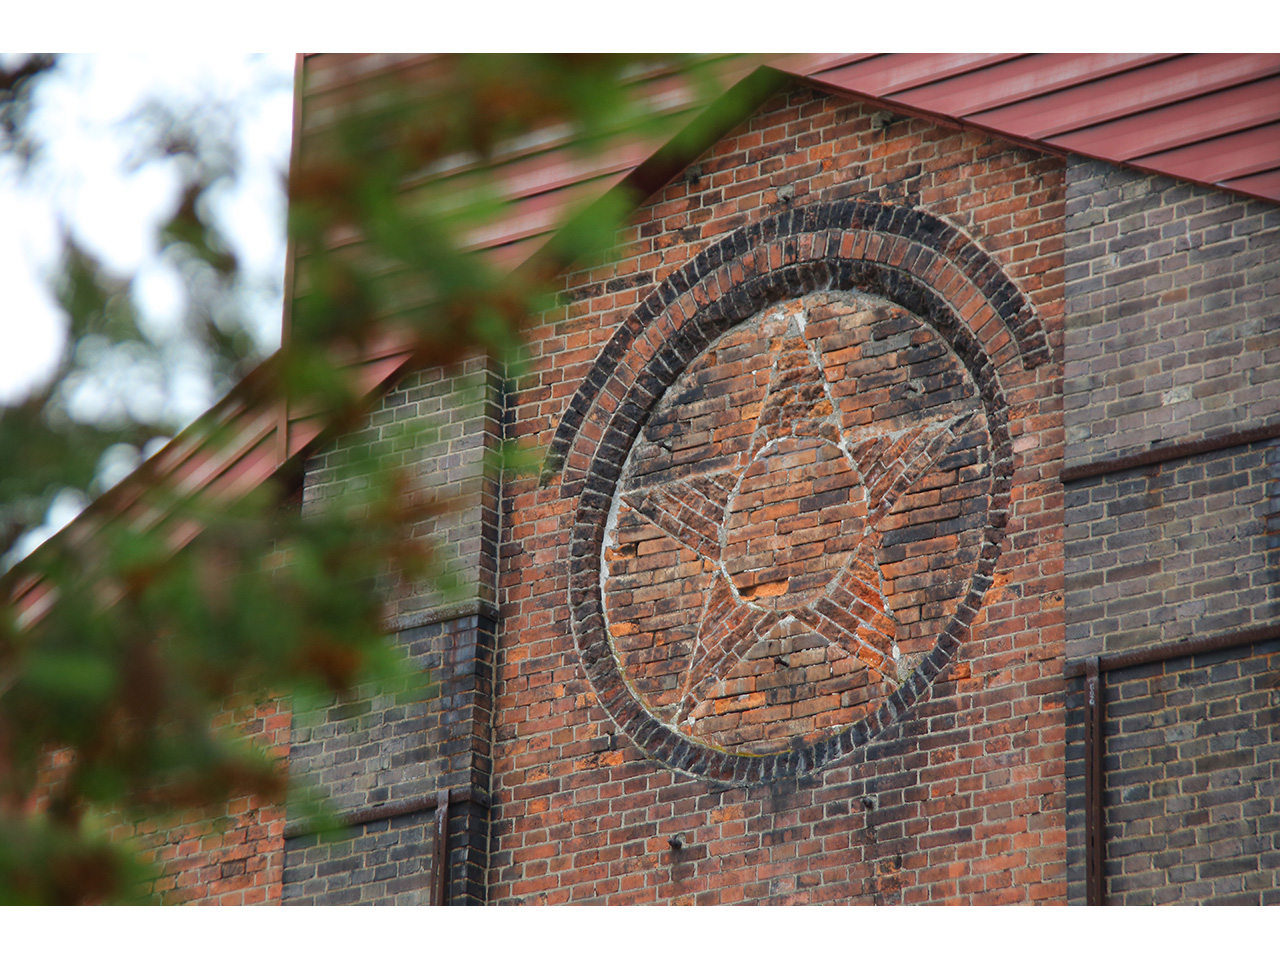 画像:旧北海道炭礦鉄道岩見沢工場(岩見沢レールセンター)(3)